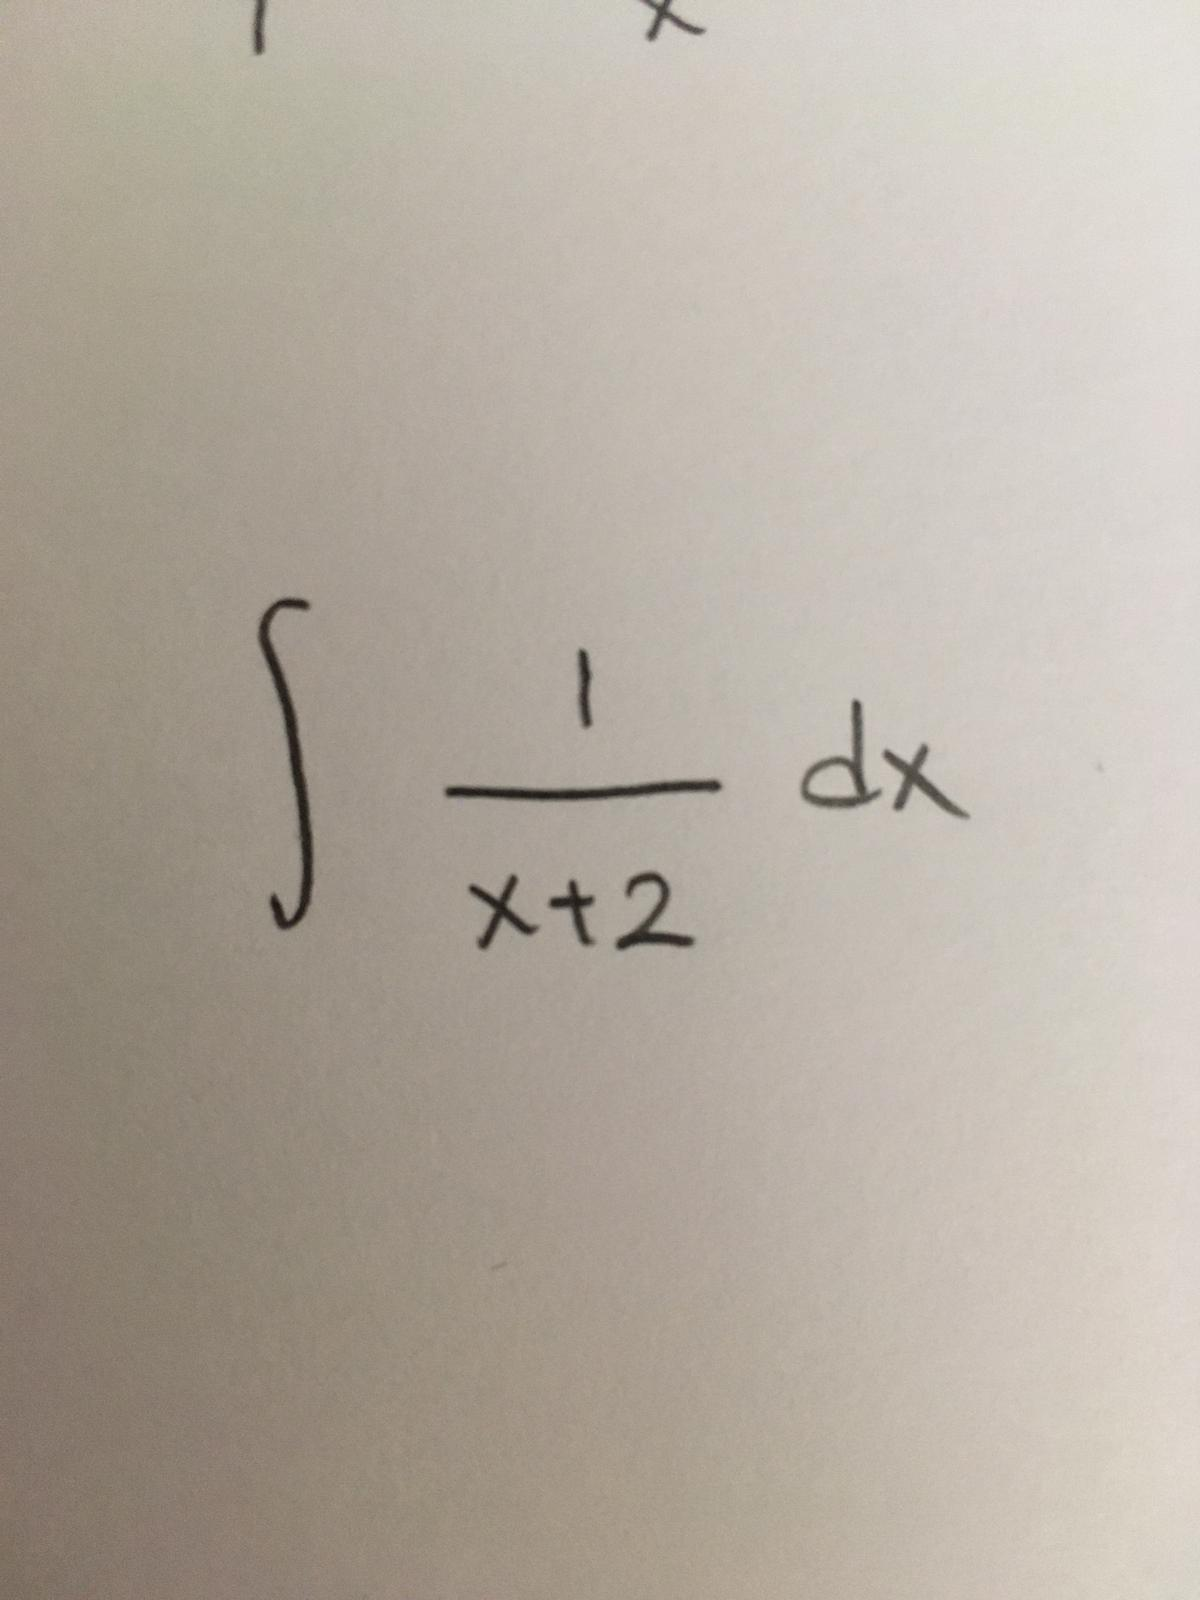 dx X+2